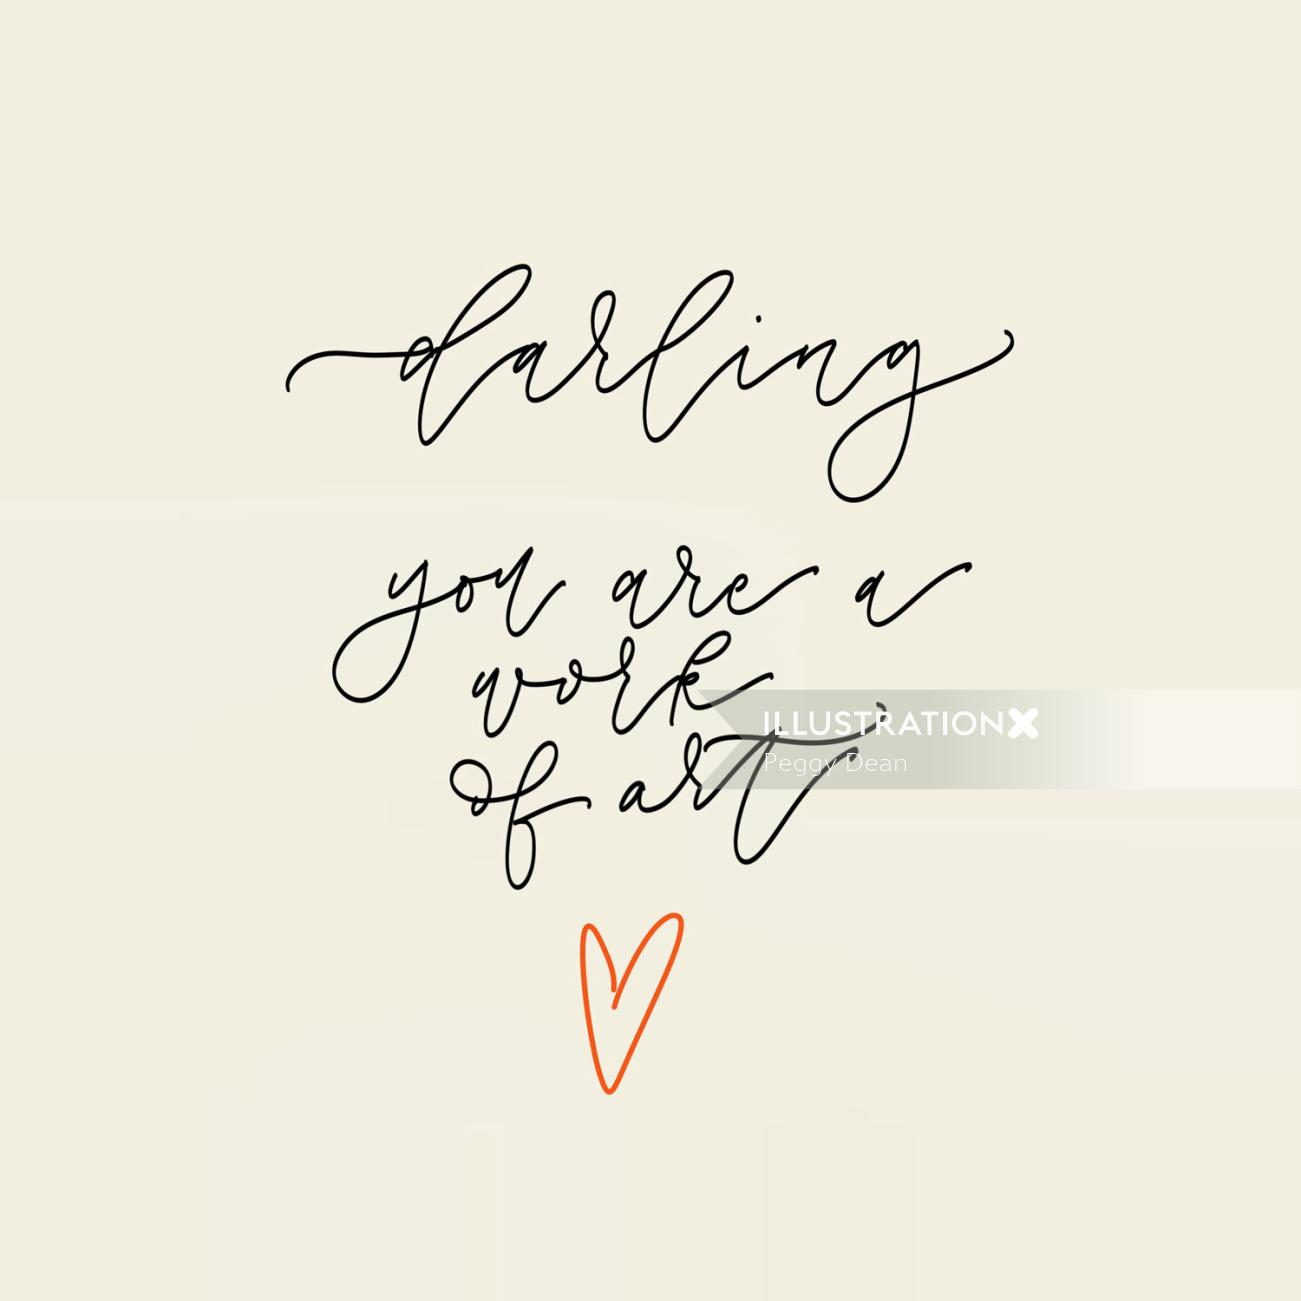 Darling your a work of art lettering illustration